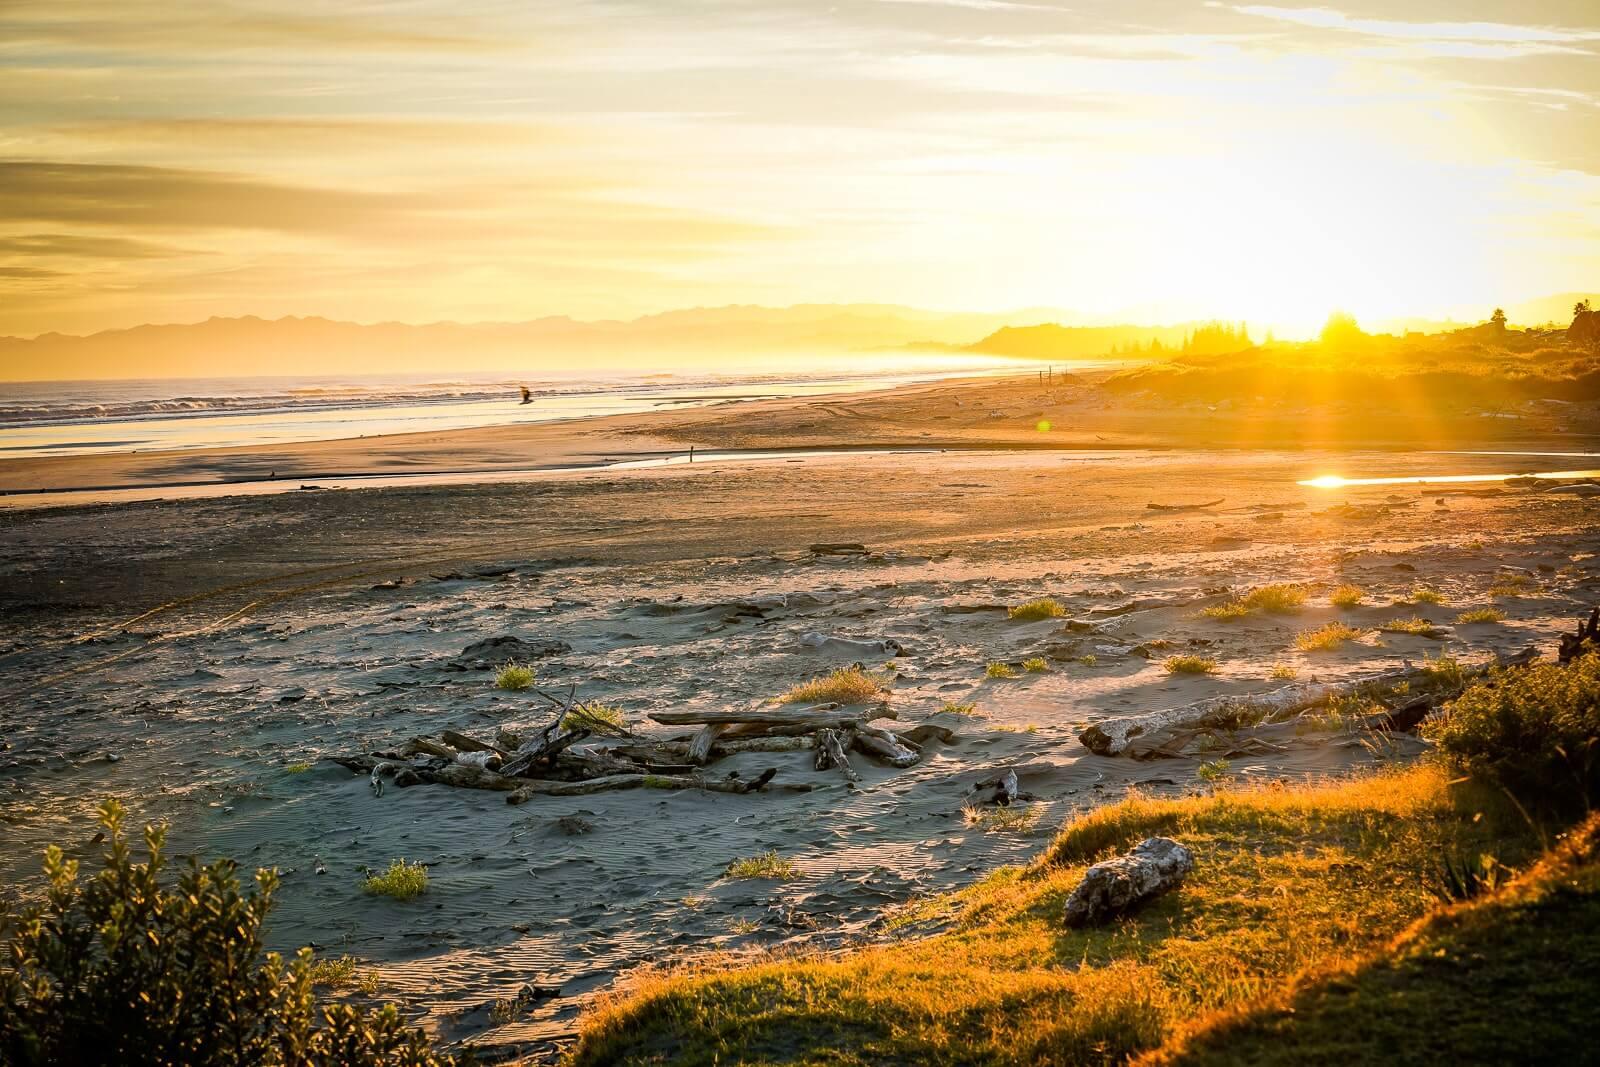 Bay of Plenty - Prachtige stranden waaronder Hukuwai Beach